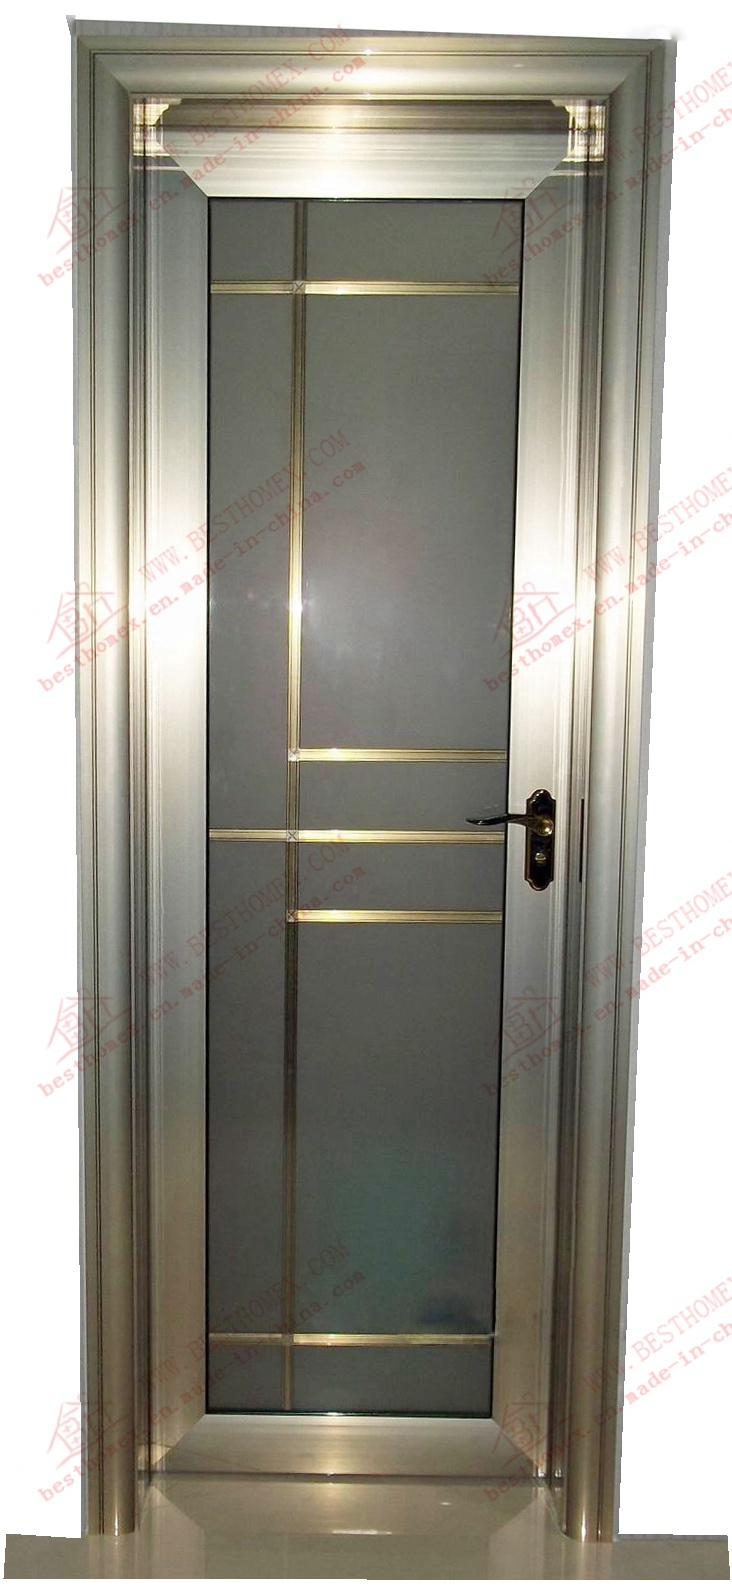 China High Quality Pvdf Coated Aluminum Toilet Door Bha Dc25